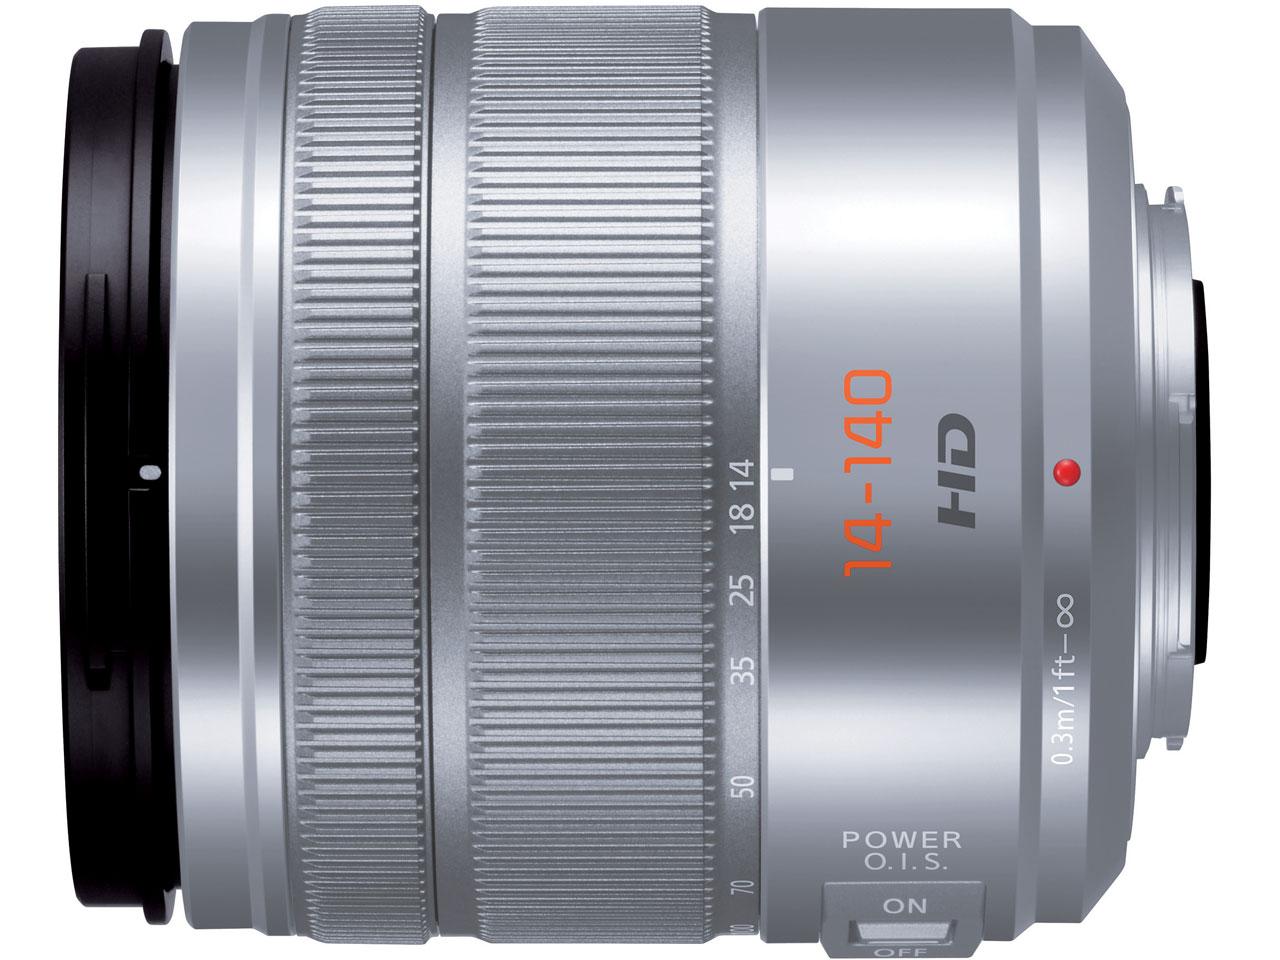 『本体』 LUMIX G VARIO 14-140mm/F3.5-5.6 ASPH./POWER O.I.S. H-FS14140-S [シルバー] の製品画像